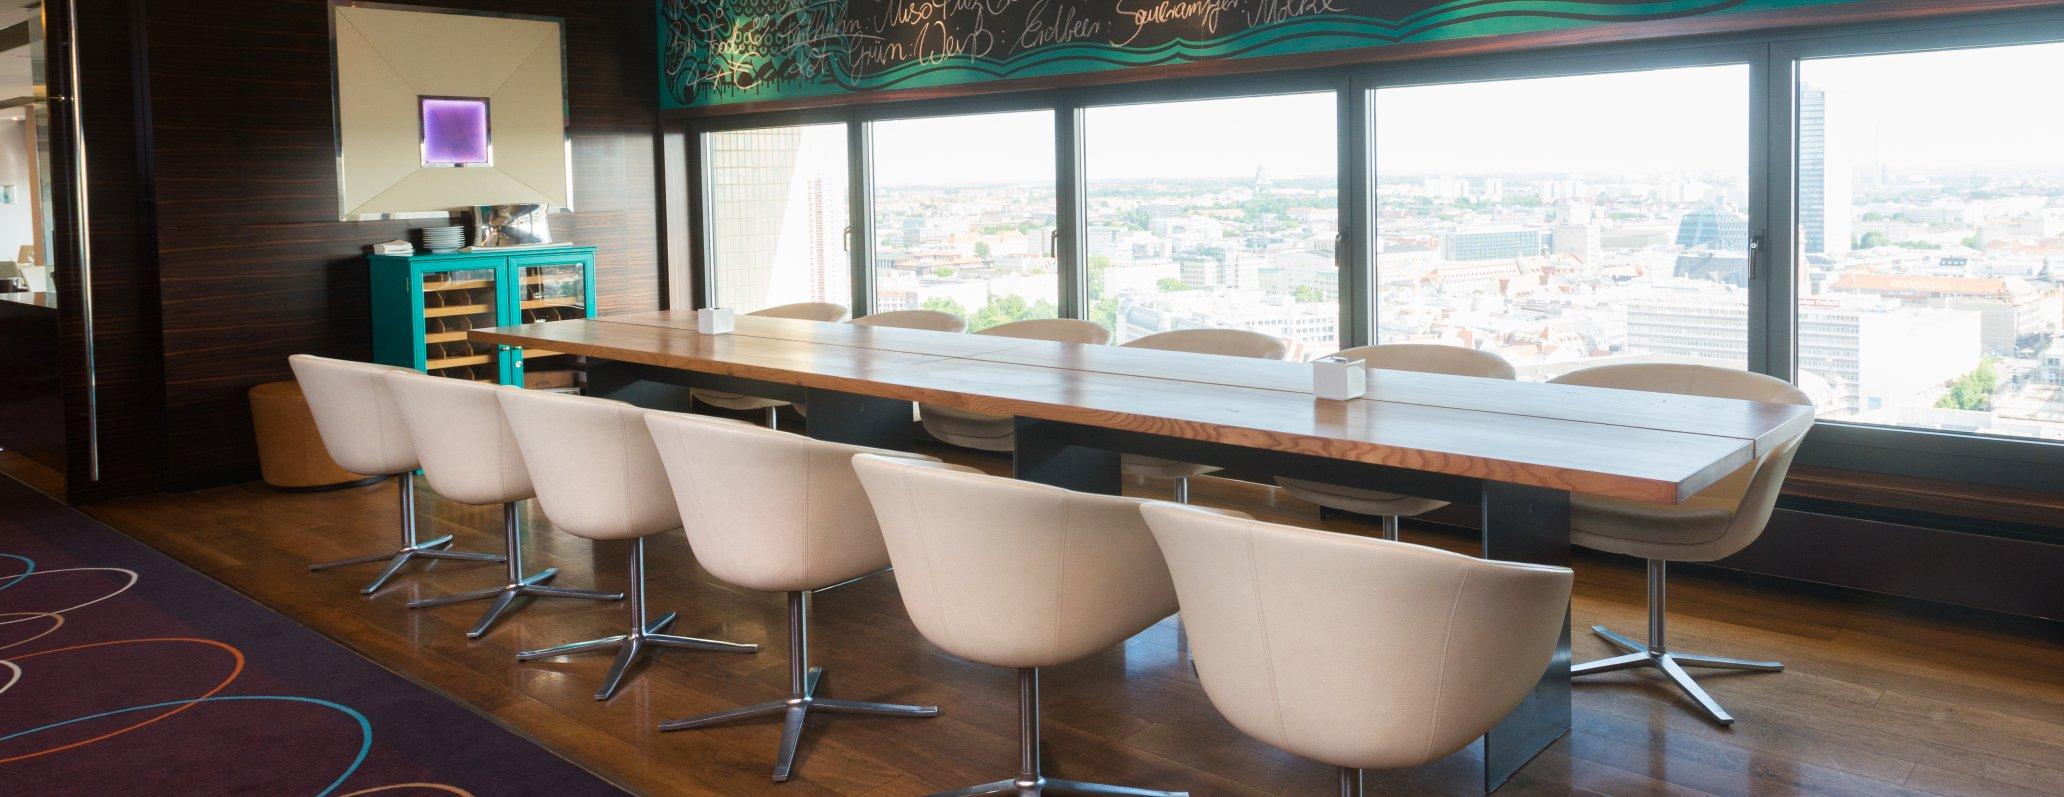 Restaurant Falco Leipzig large table